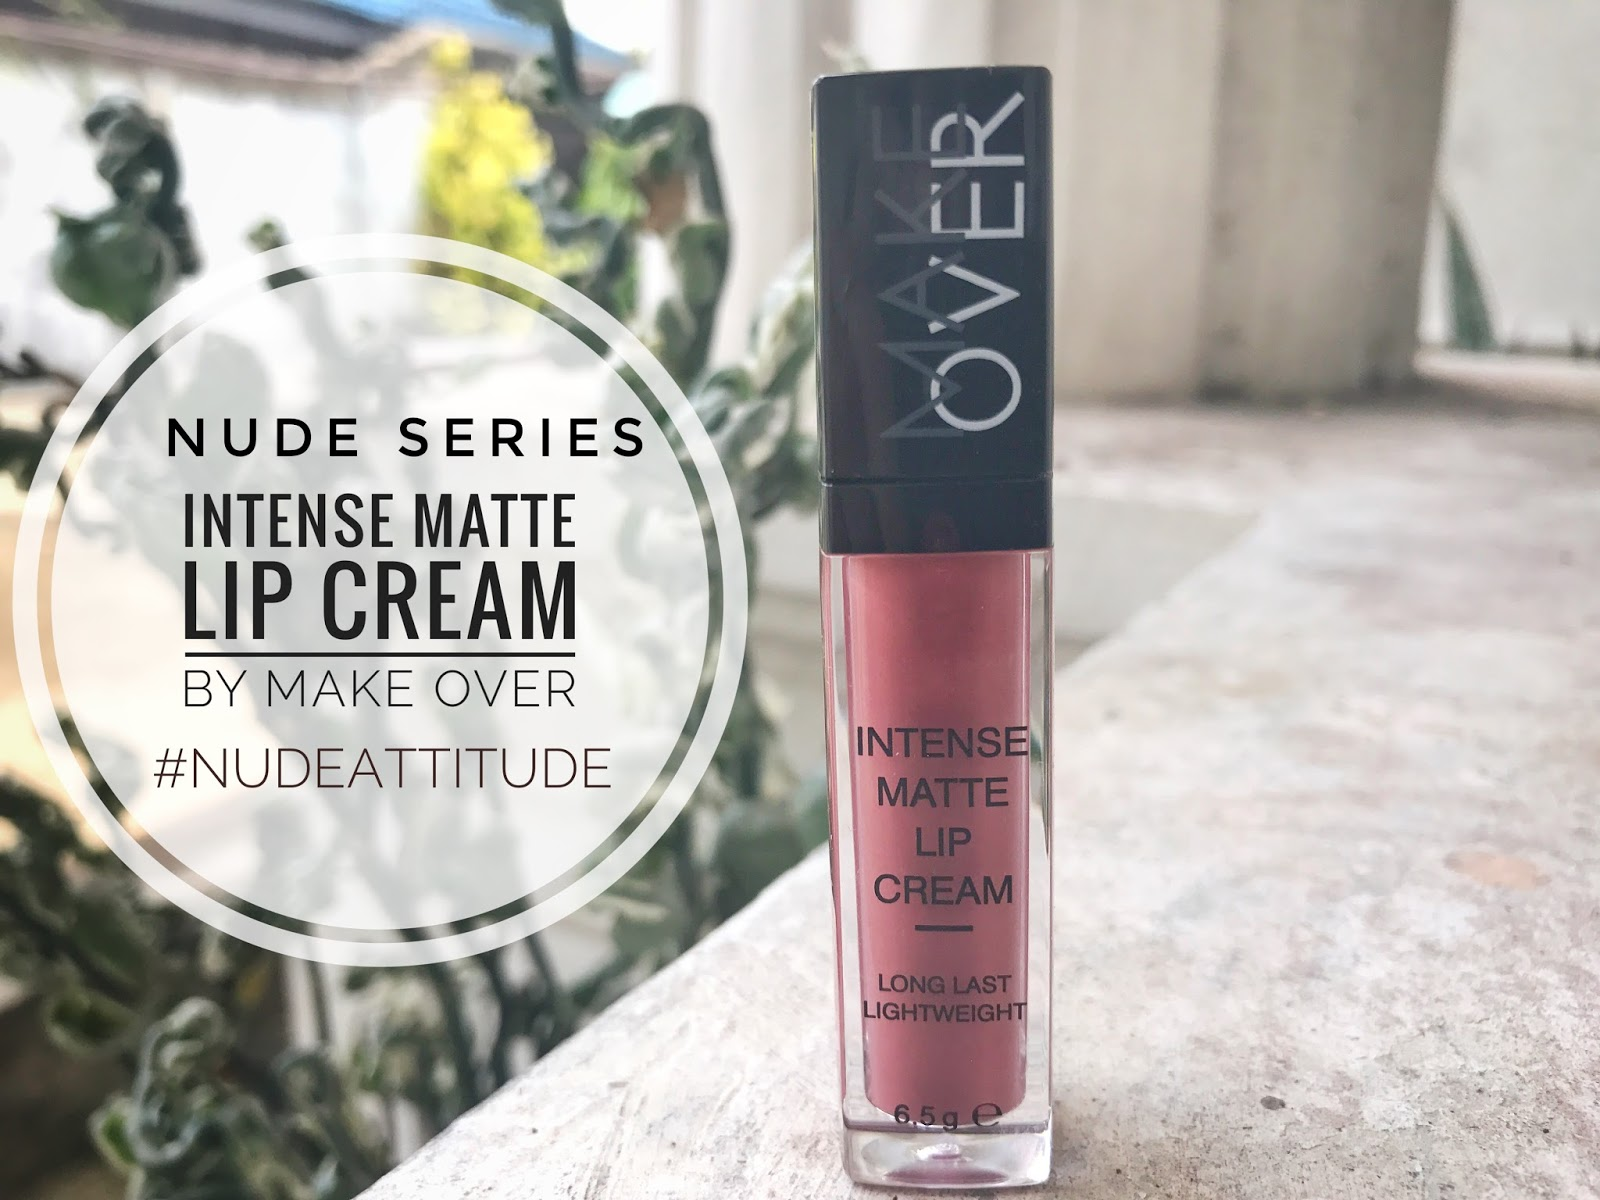 Beauty Haul Ica Review Nude Edition Make Over Intense Matte Lip Lips Cream Judge My Nudeattitude